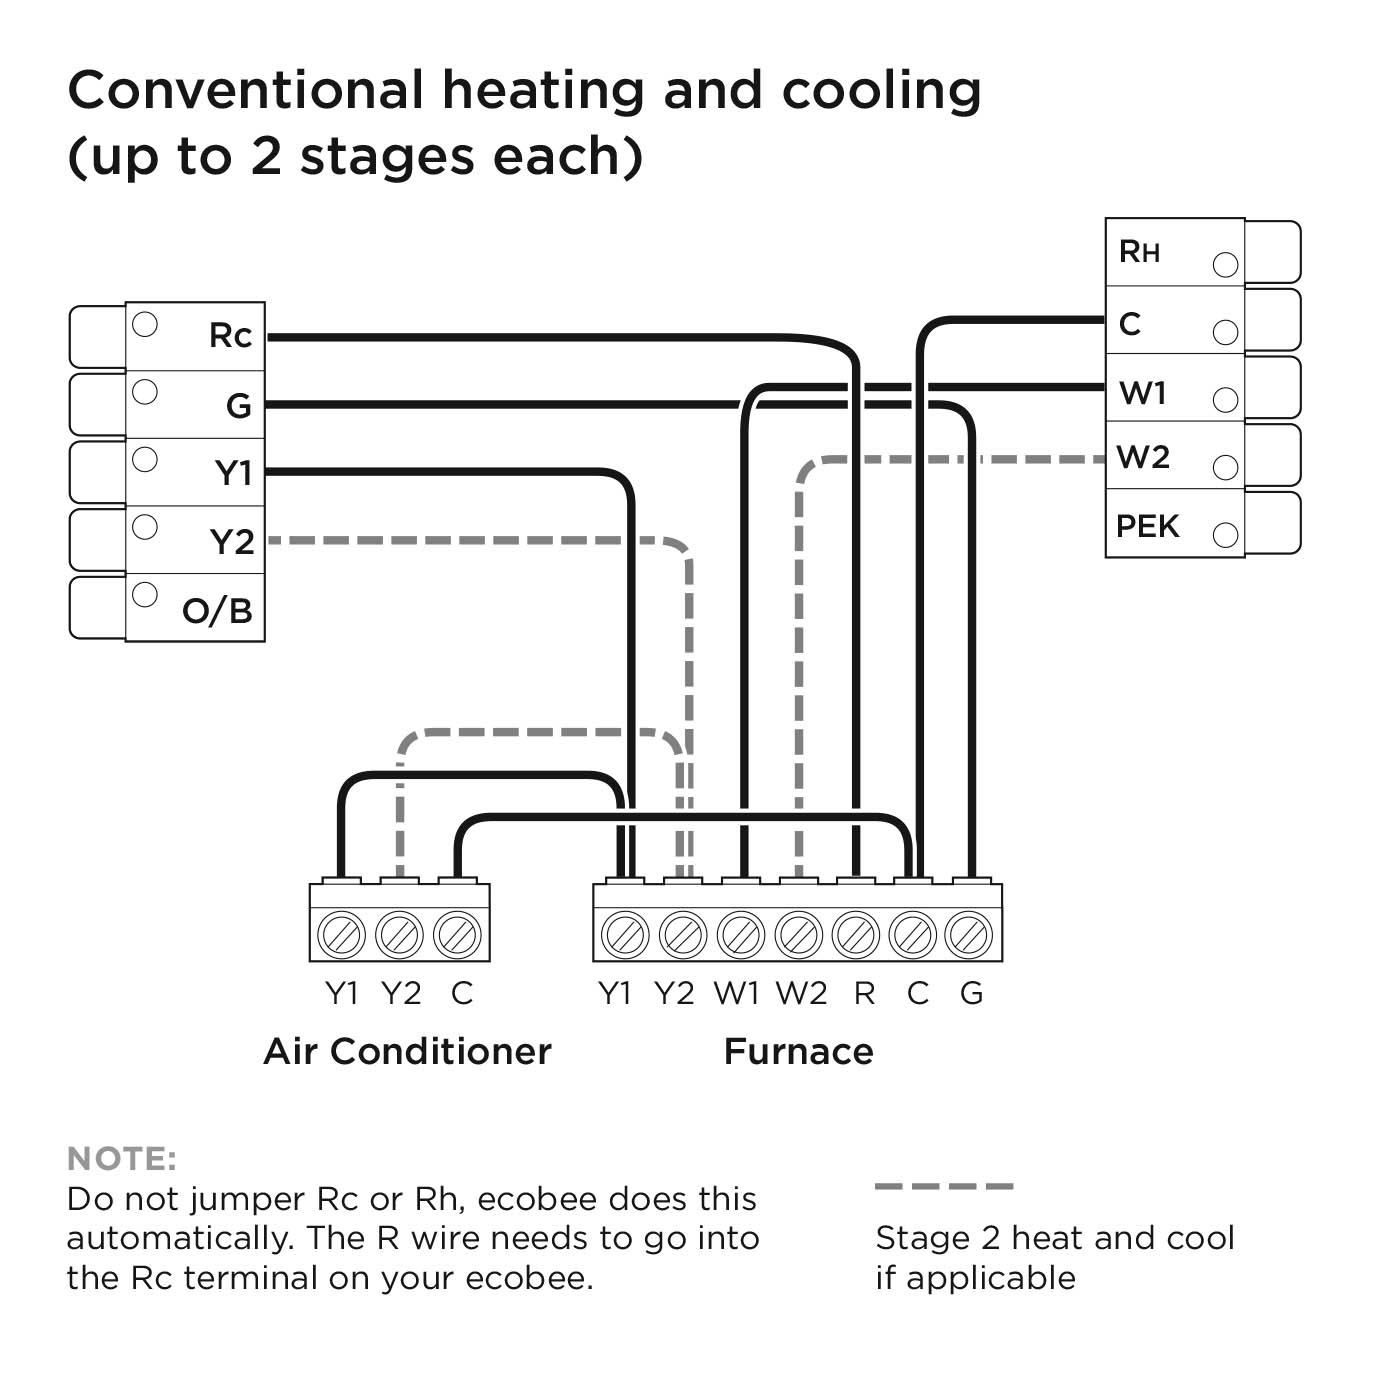 Ecobee3 Lite Wiring Diagrams – Ecobee Support - Ecobee3 Wiring Diagram